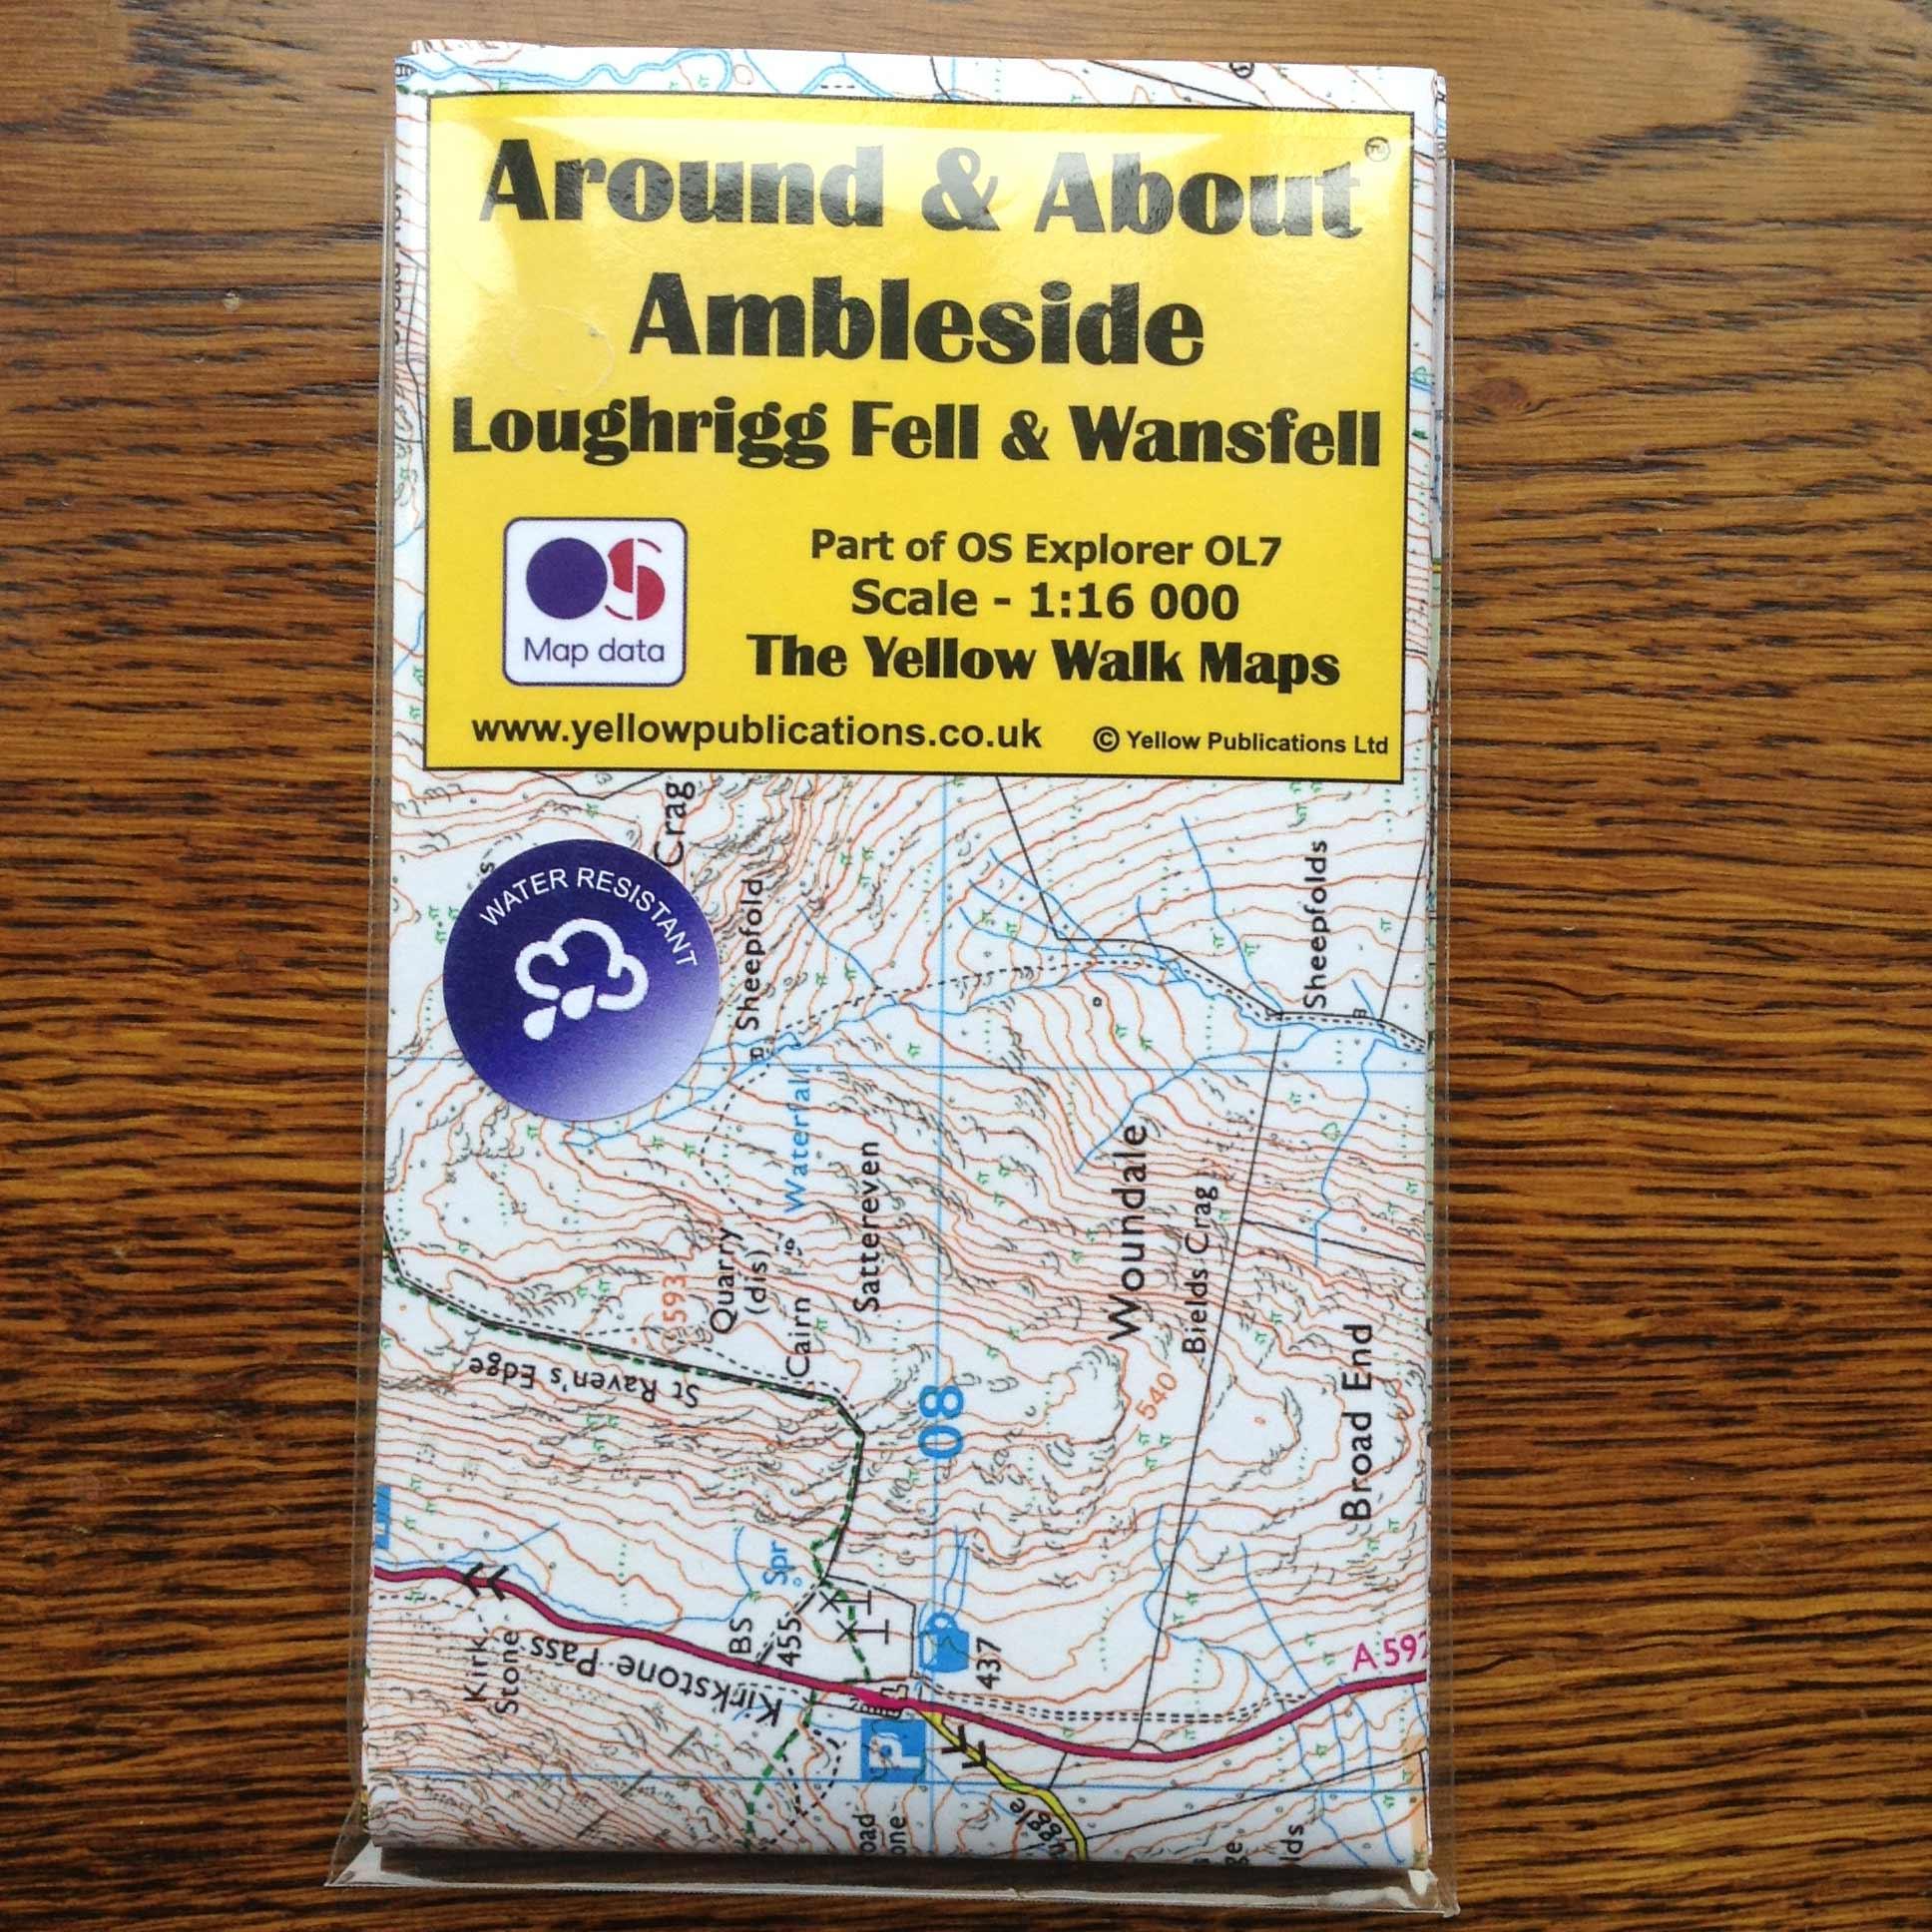 Ambleside, loughrigg & wansfell walking map